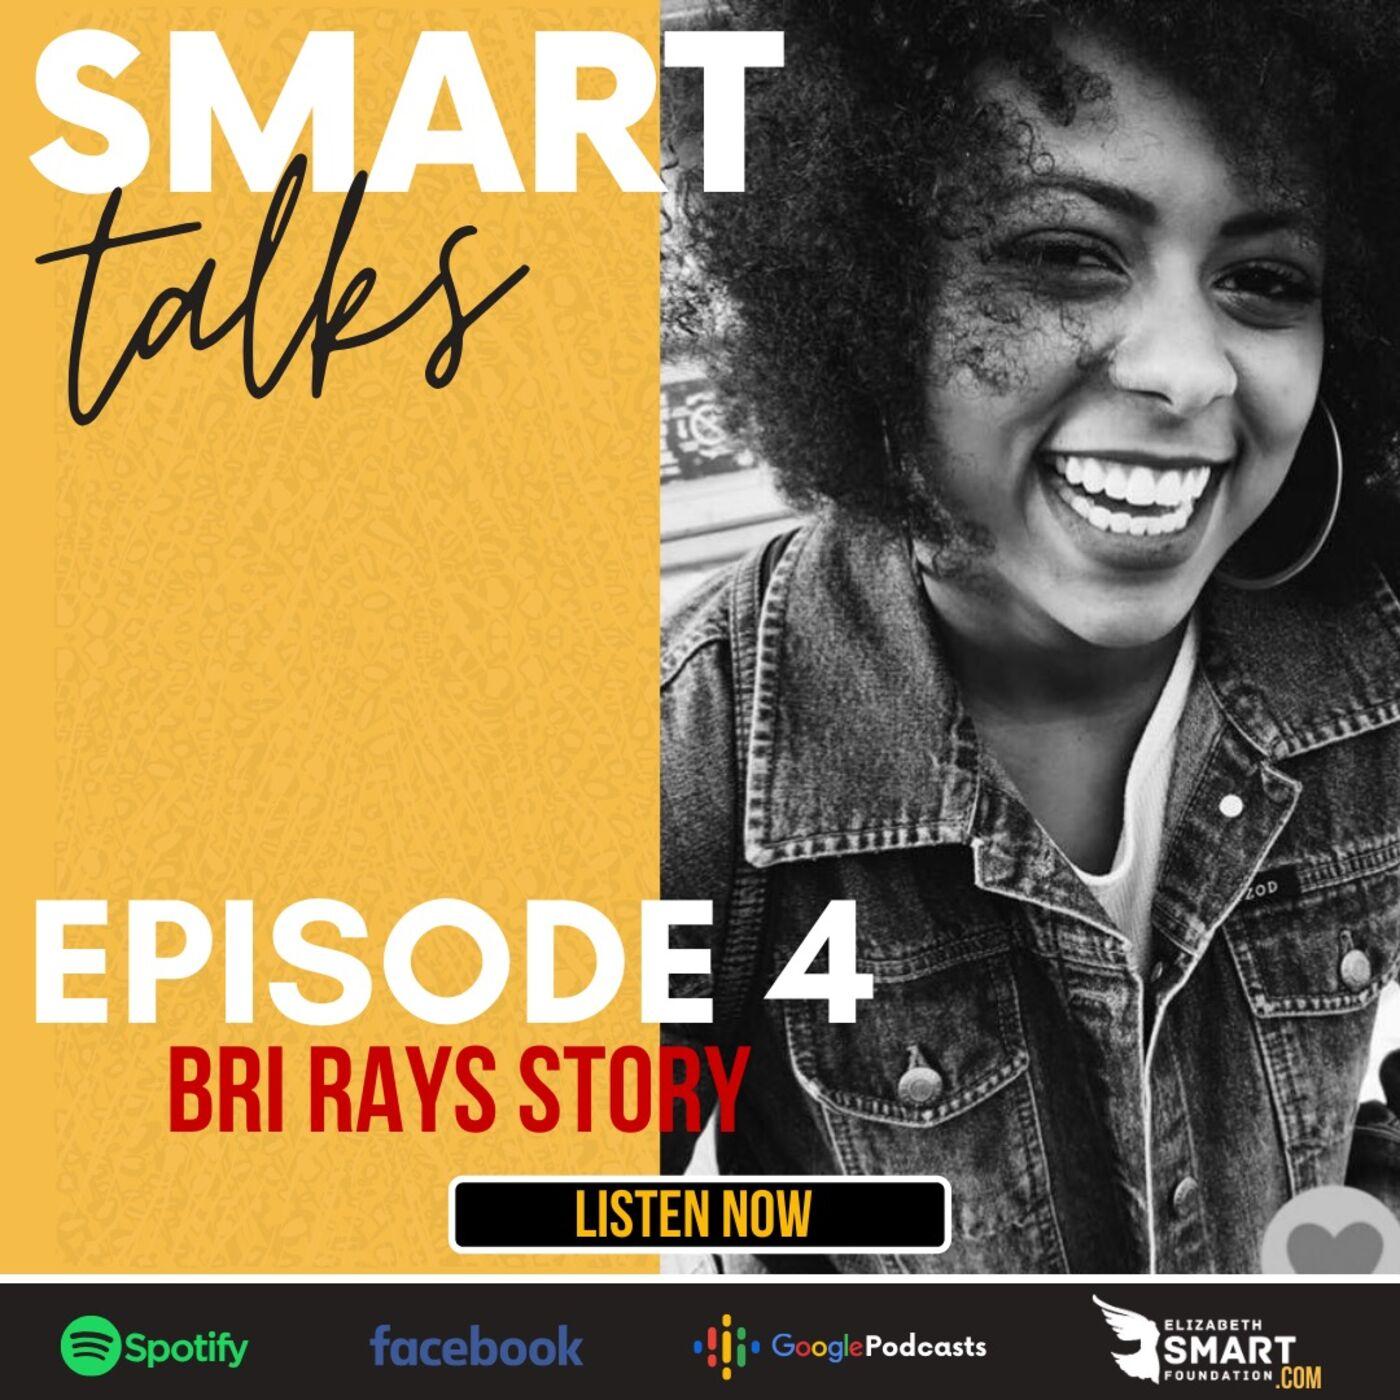 Episode 4: Bri's Story